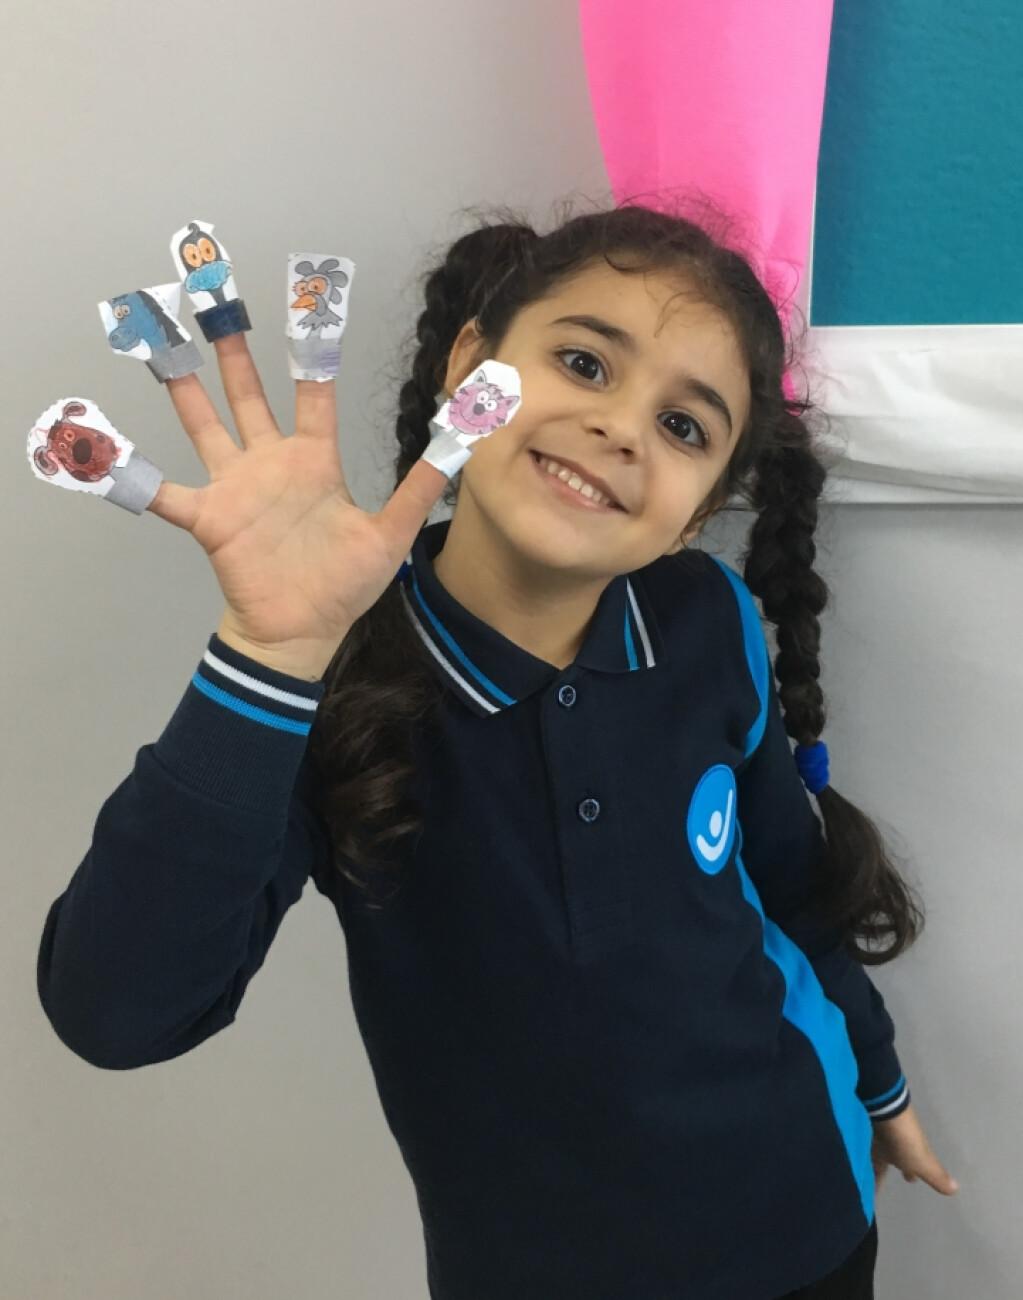 Finger Puppet Yaparak Hem Eğlendik Hem Öğrendik | Pendik İlkokulu...